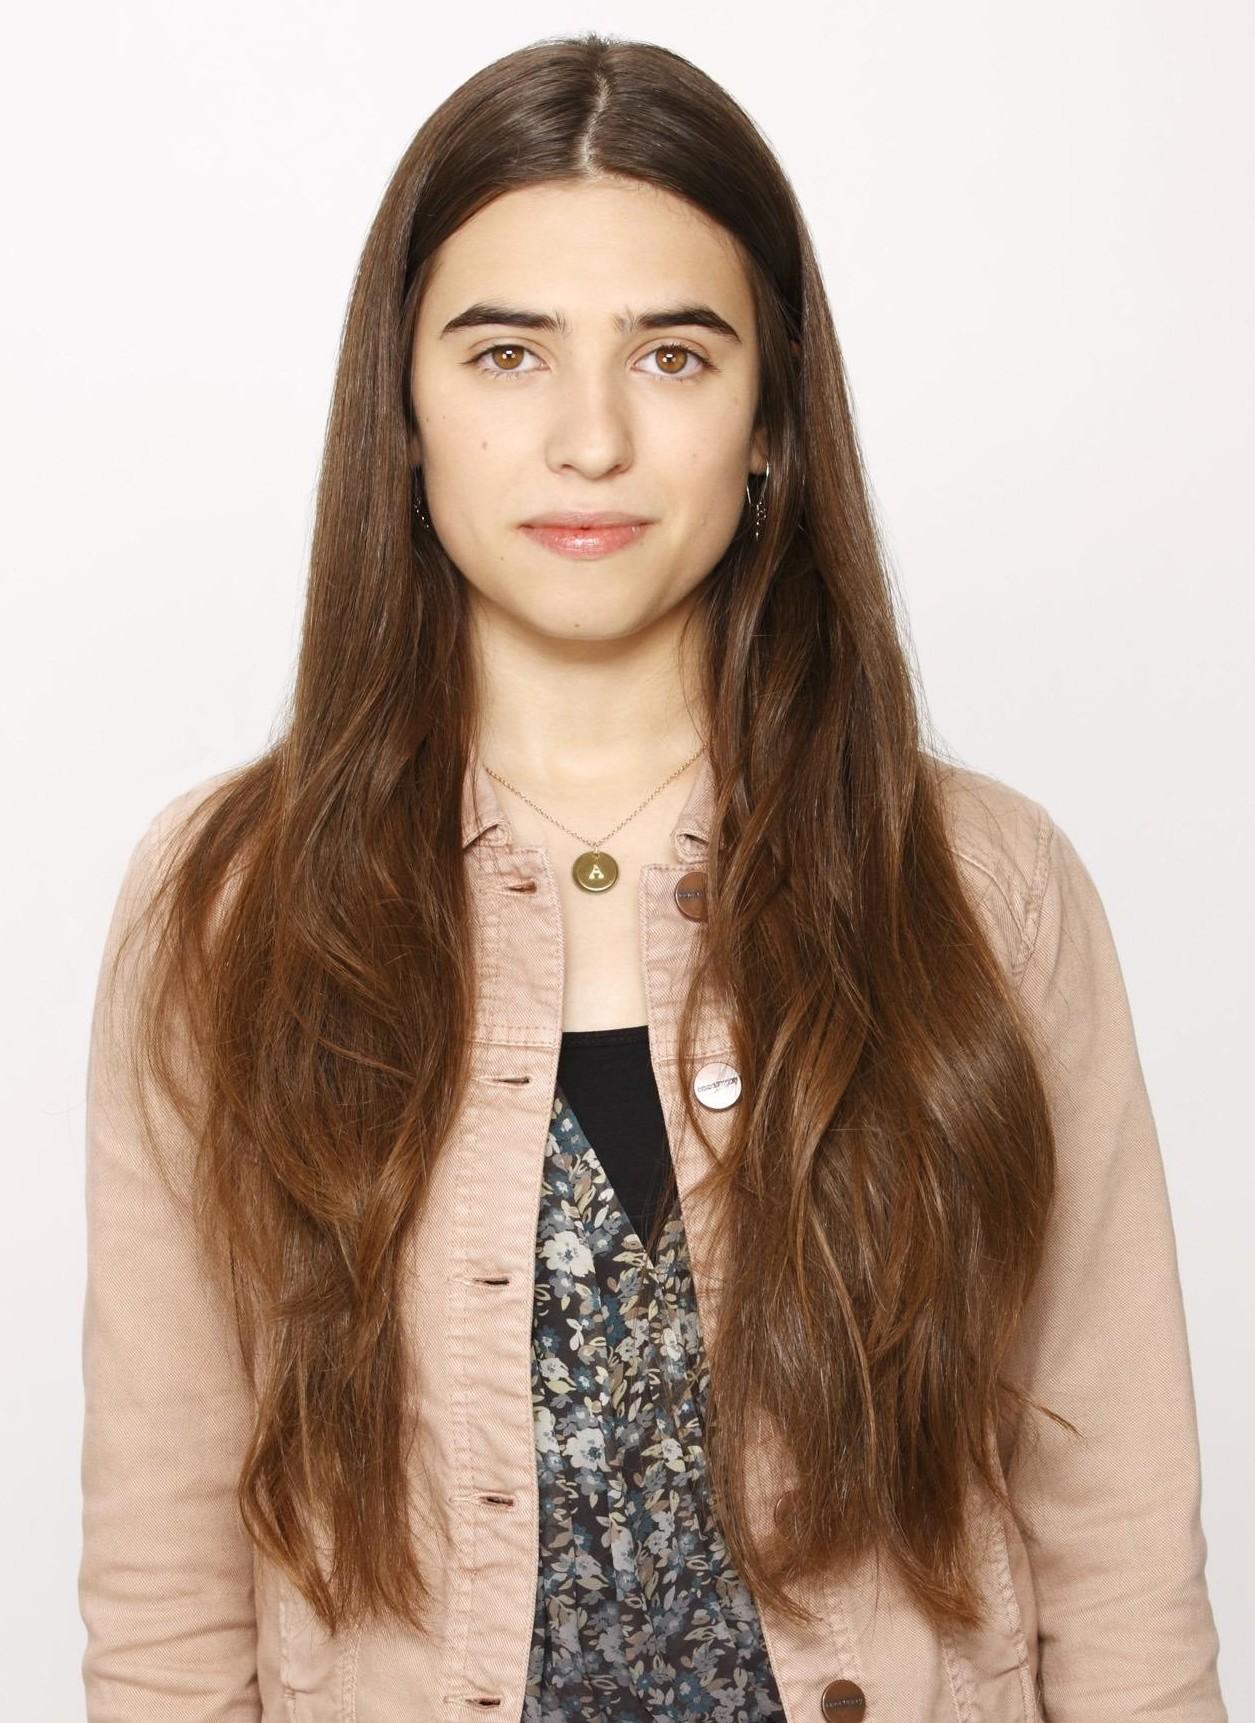 Clara Mamet